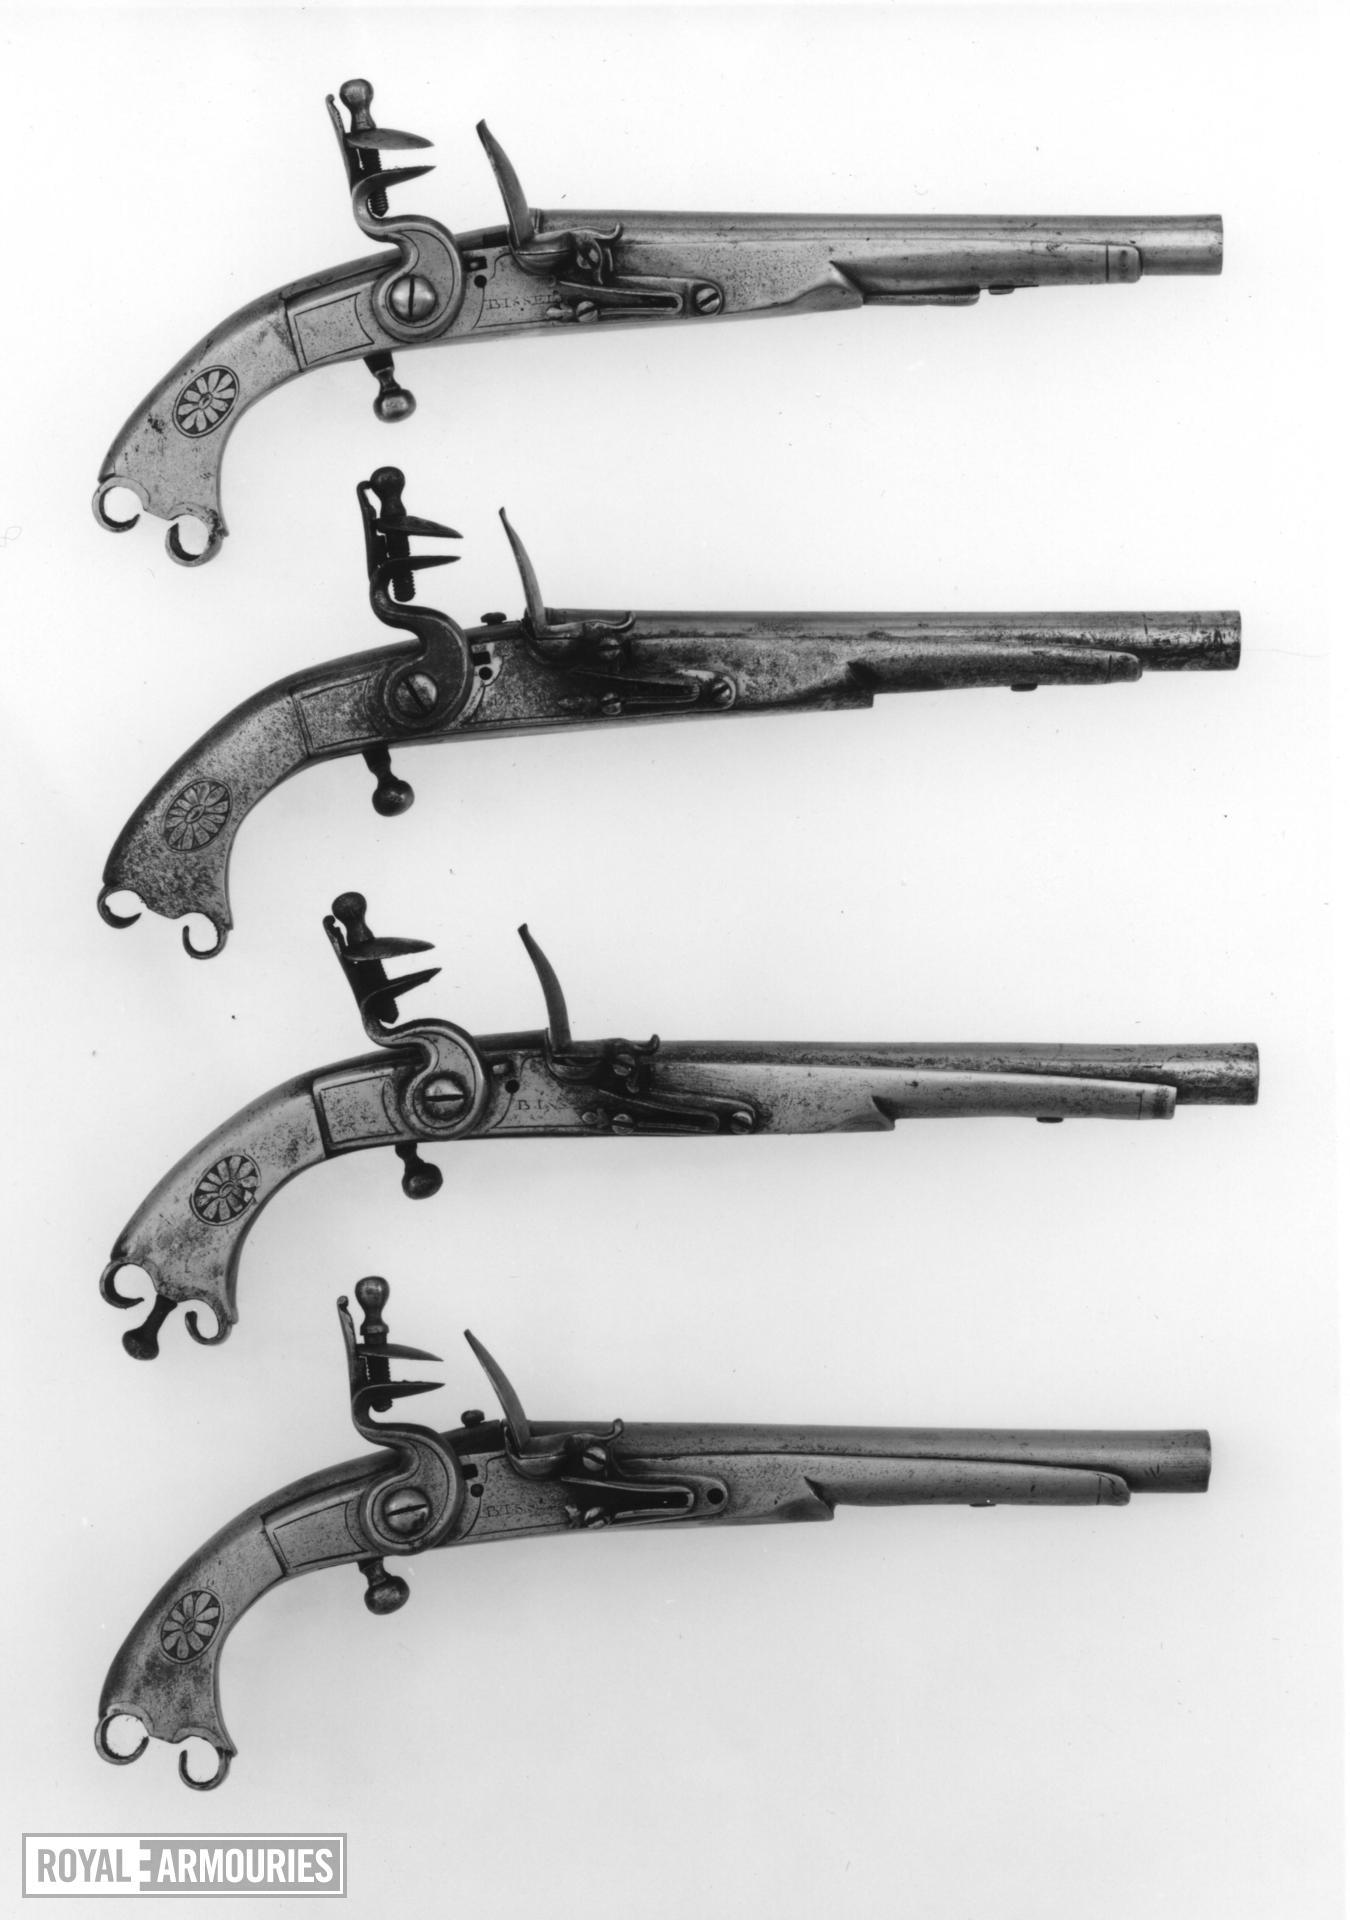 Flintlock military pistol - Scottish regimental pattern